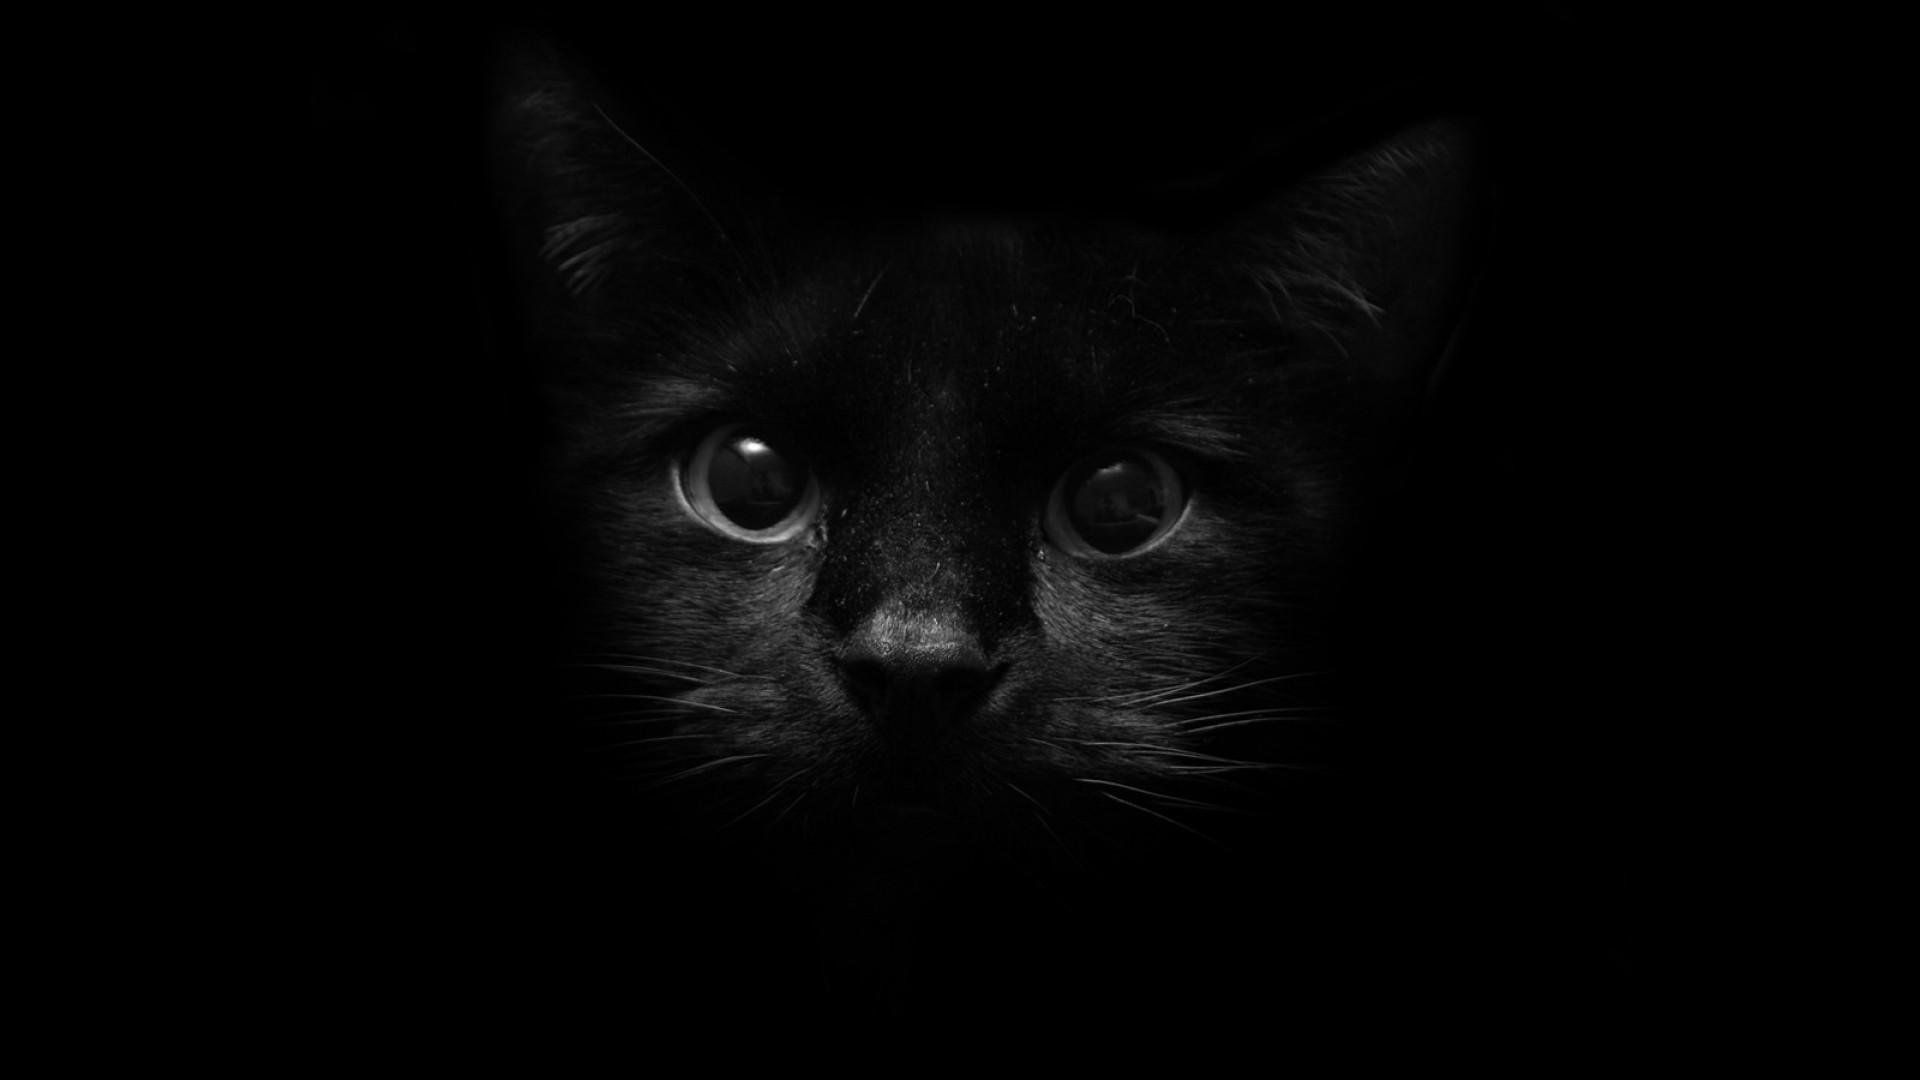 Cute Black PC Wallpaper HD